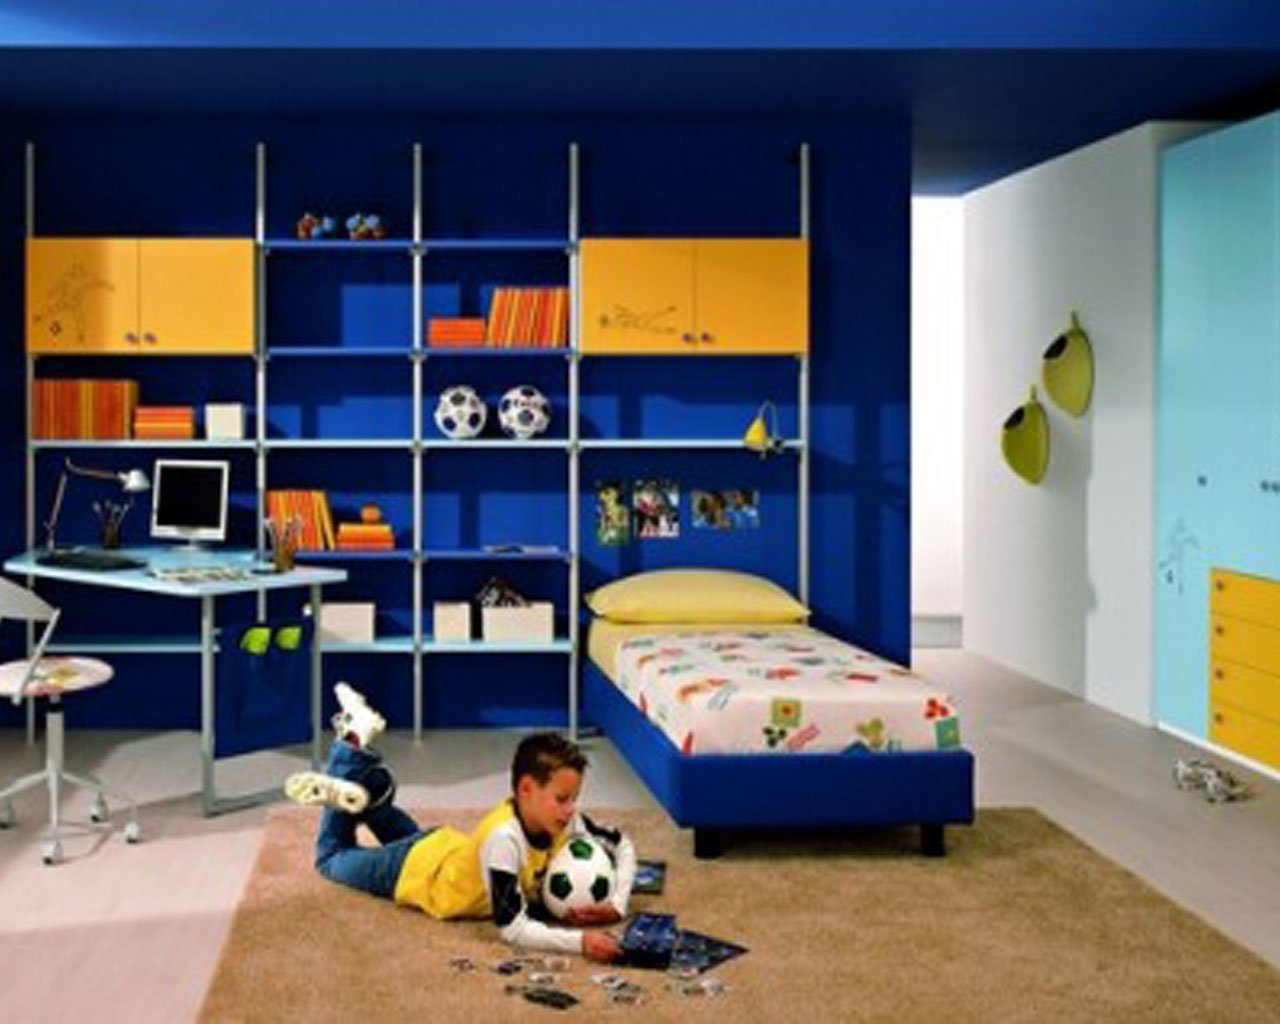 Wallpaper for teenage boys room wallpapersafari - Bedroom designs for kids children ...